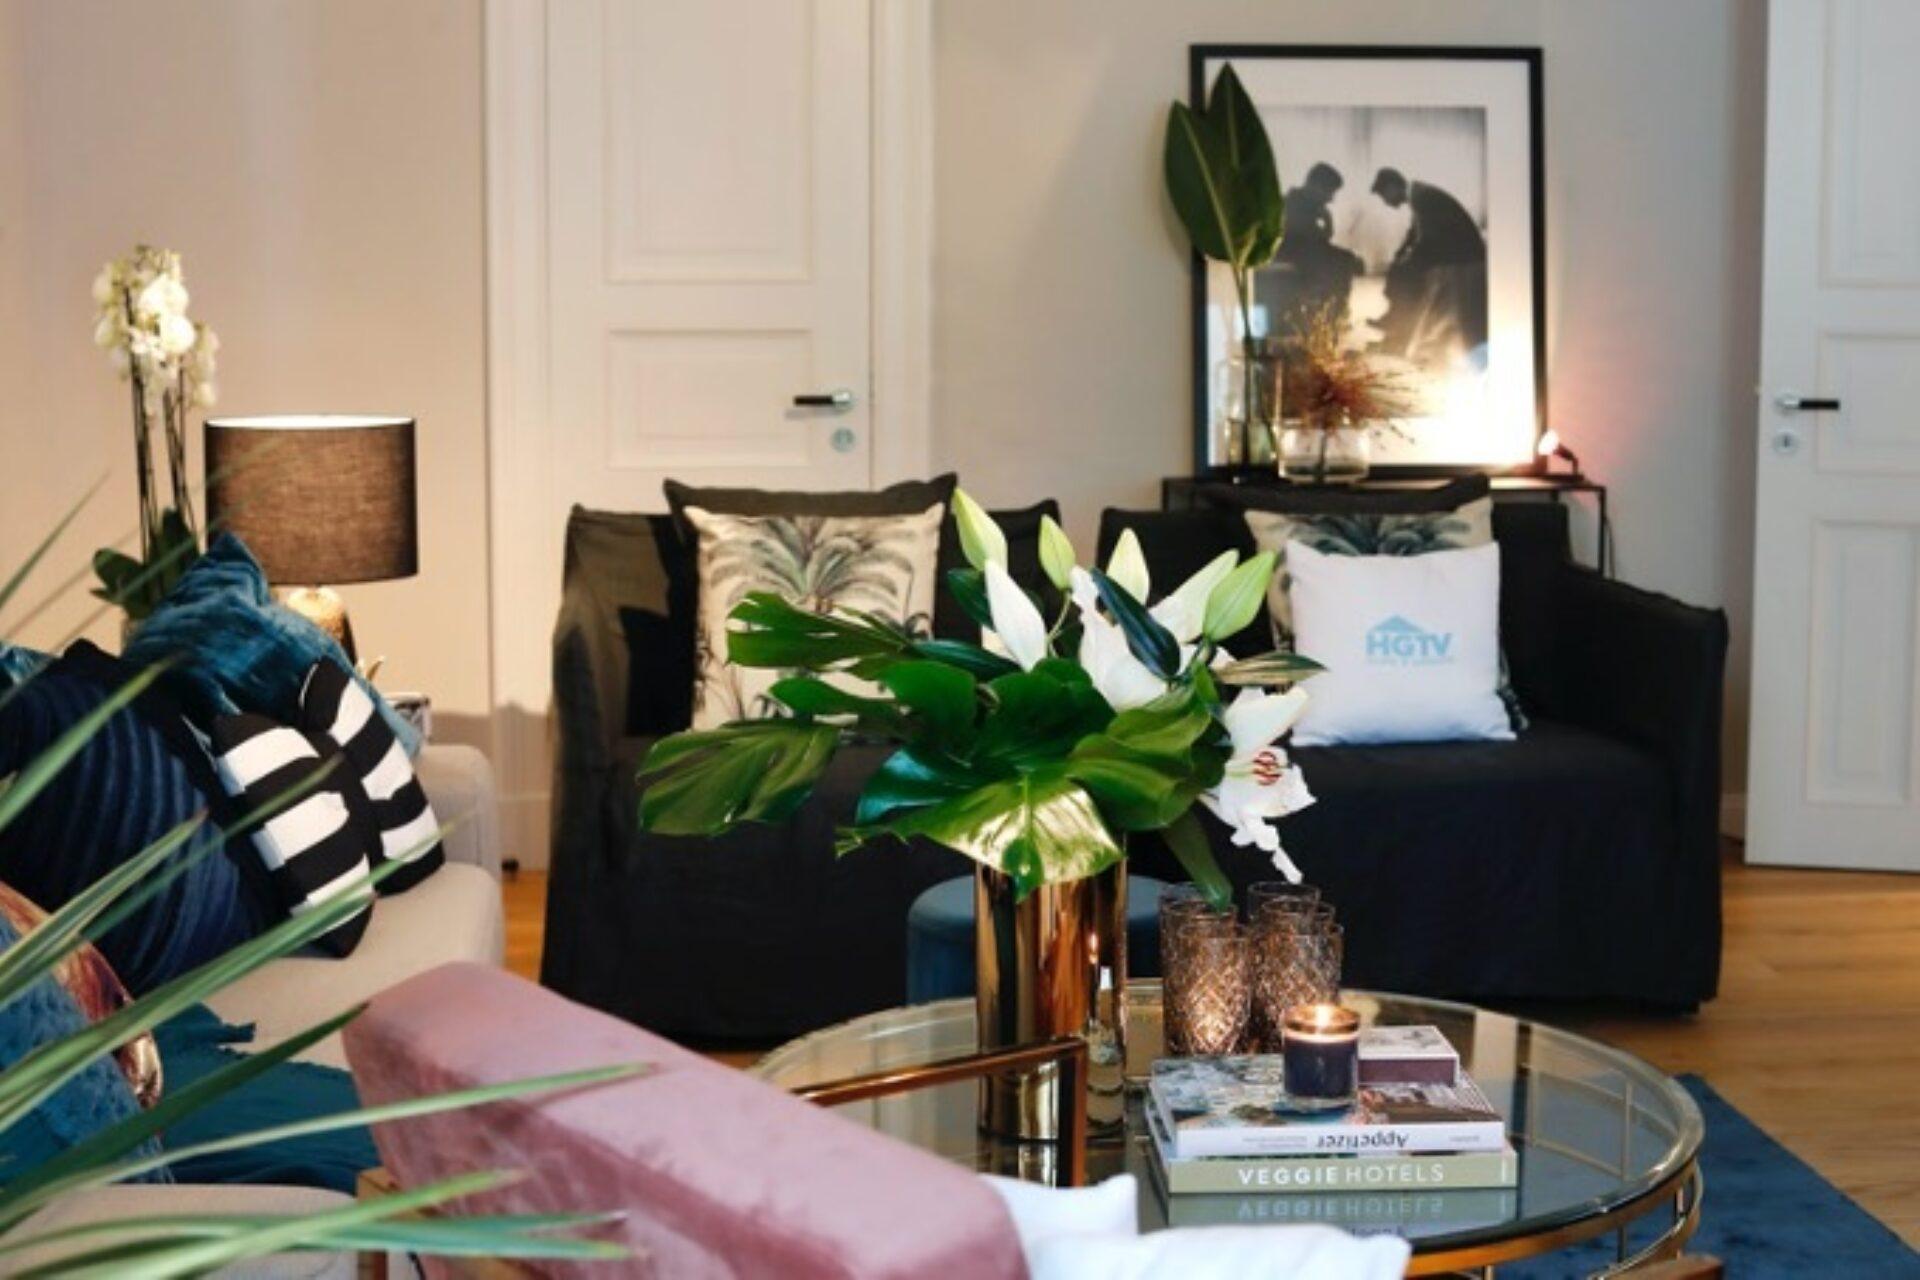 Home & Garden TV Event Hamburg Apartment